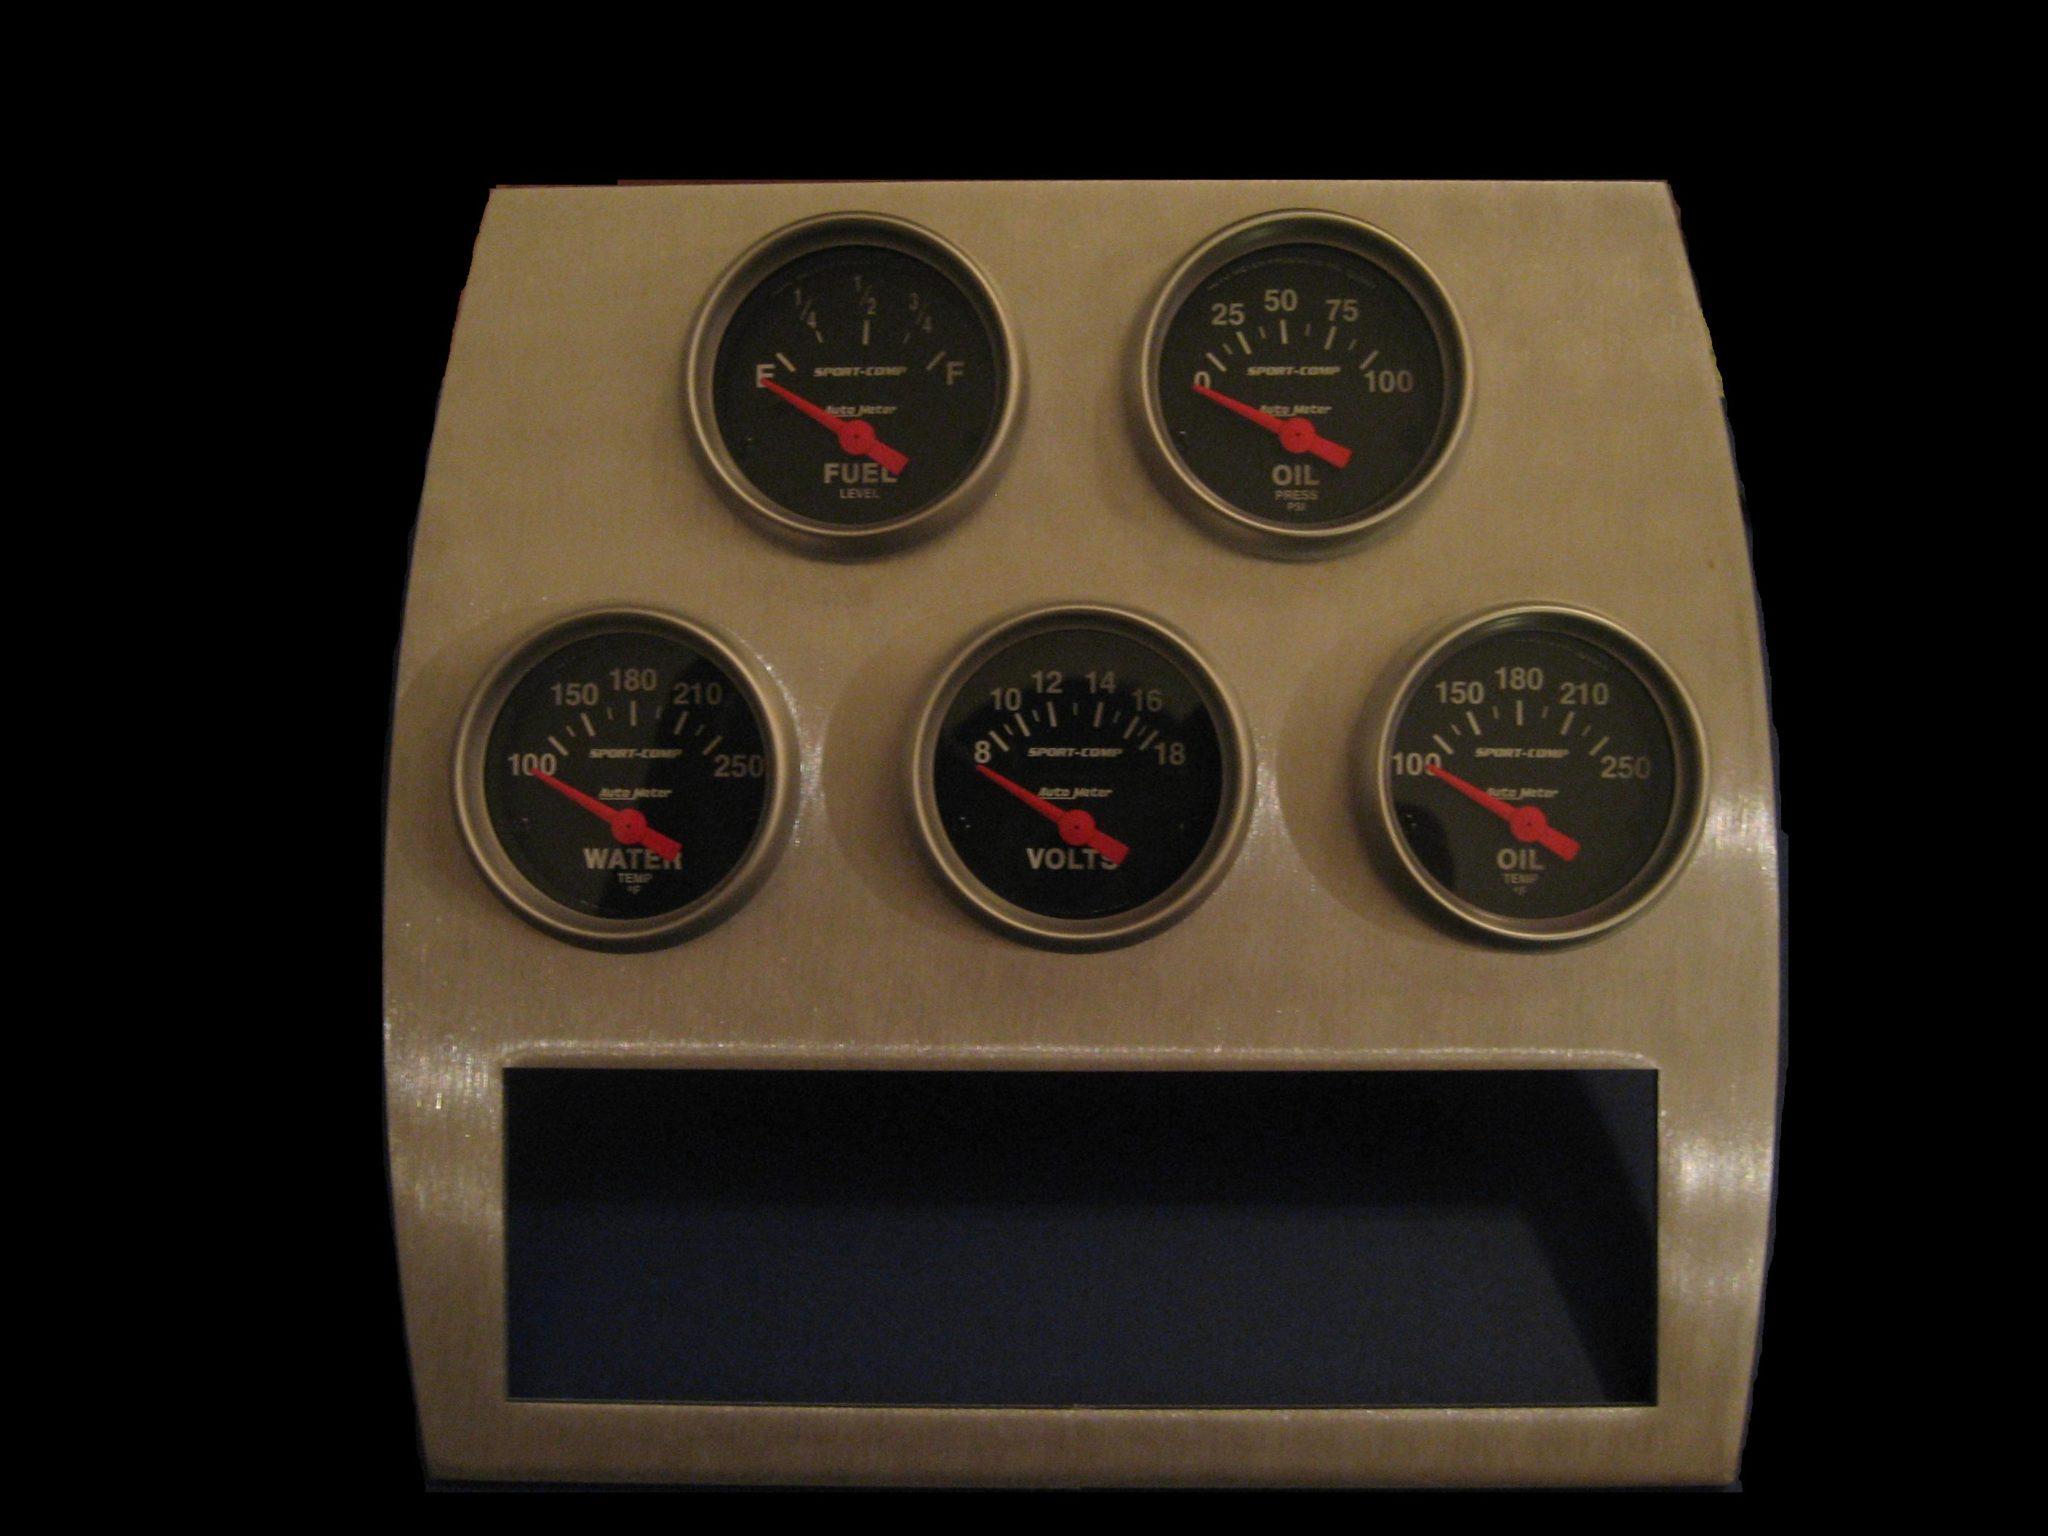 1982 Corvette Gauges : Corvette auxiliary gauge panel custom image